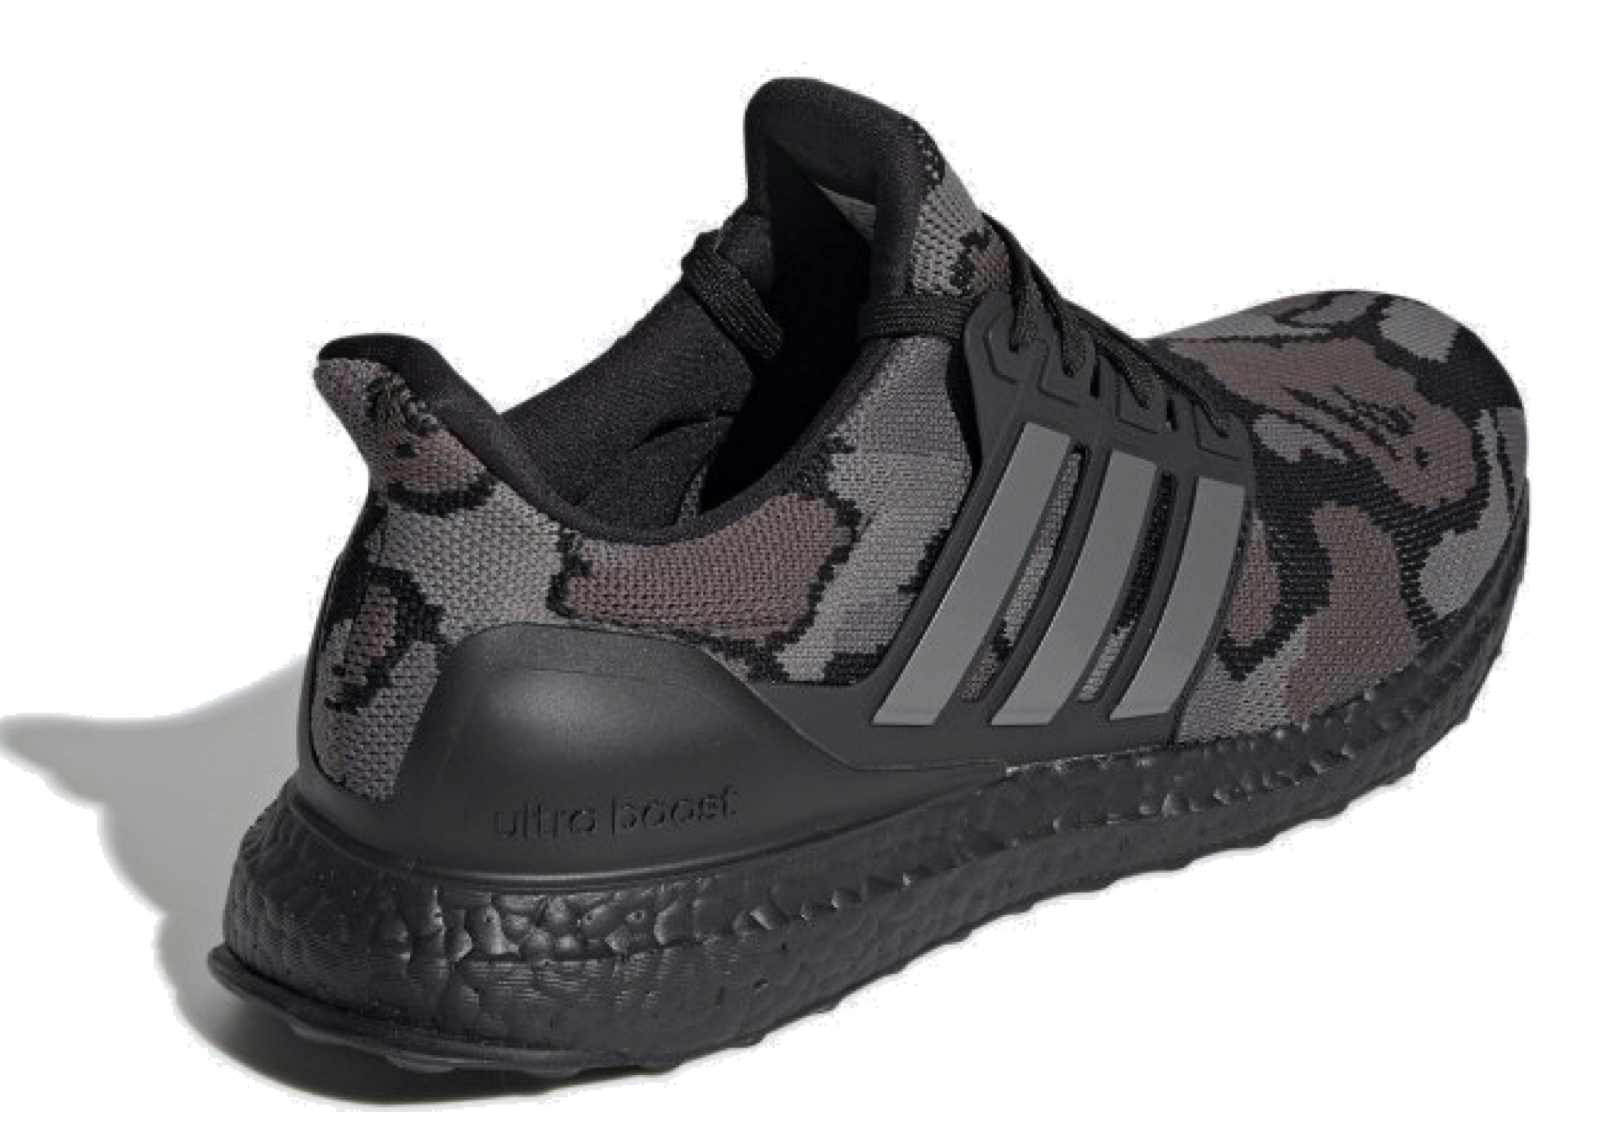 9682e1092b1 adidas Ultra Boost 4.0 Bape Camo Black - 3